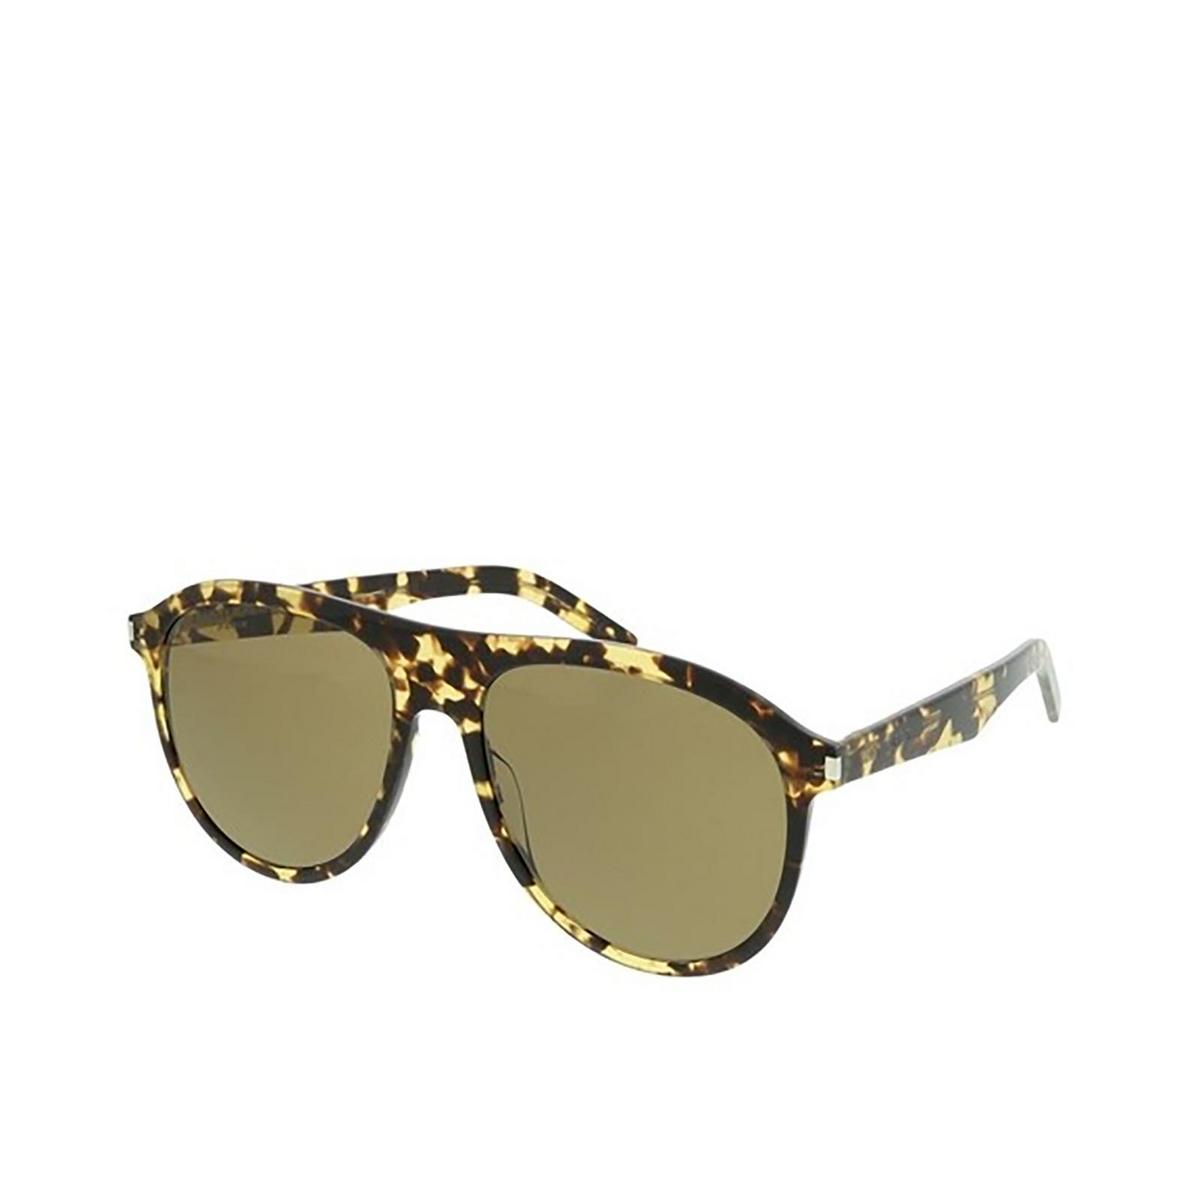 Saint Laurent® Aviator Sunglasses: SL 432 SLIM color Yellow Havana 004 - three-quarters view.